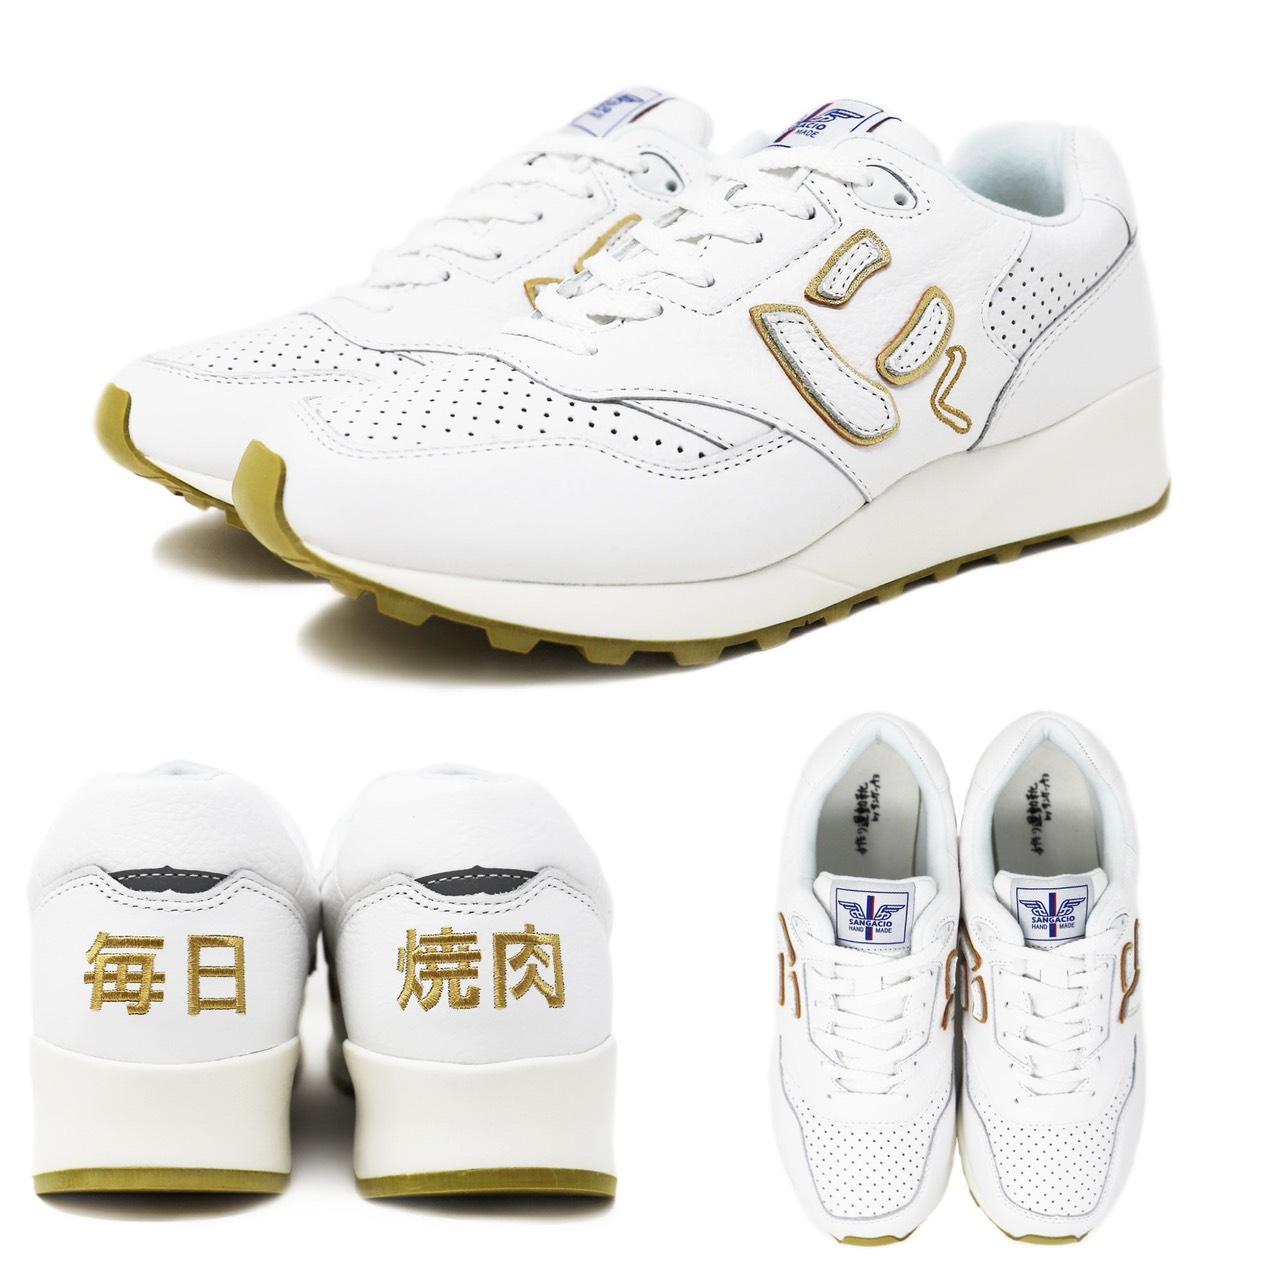 Yakiniku-sneakers-meat-beef-fashion-sangacio-Japan-food-Japanese-cool-shop-photos-2.jpg